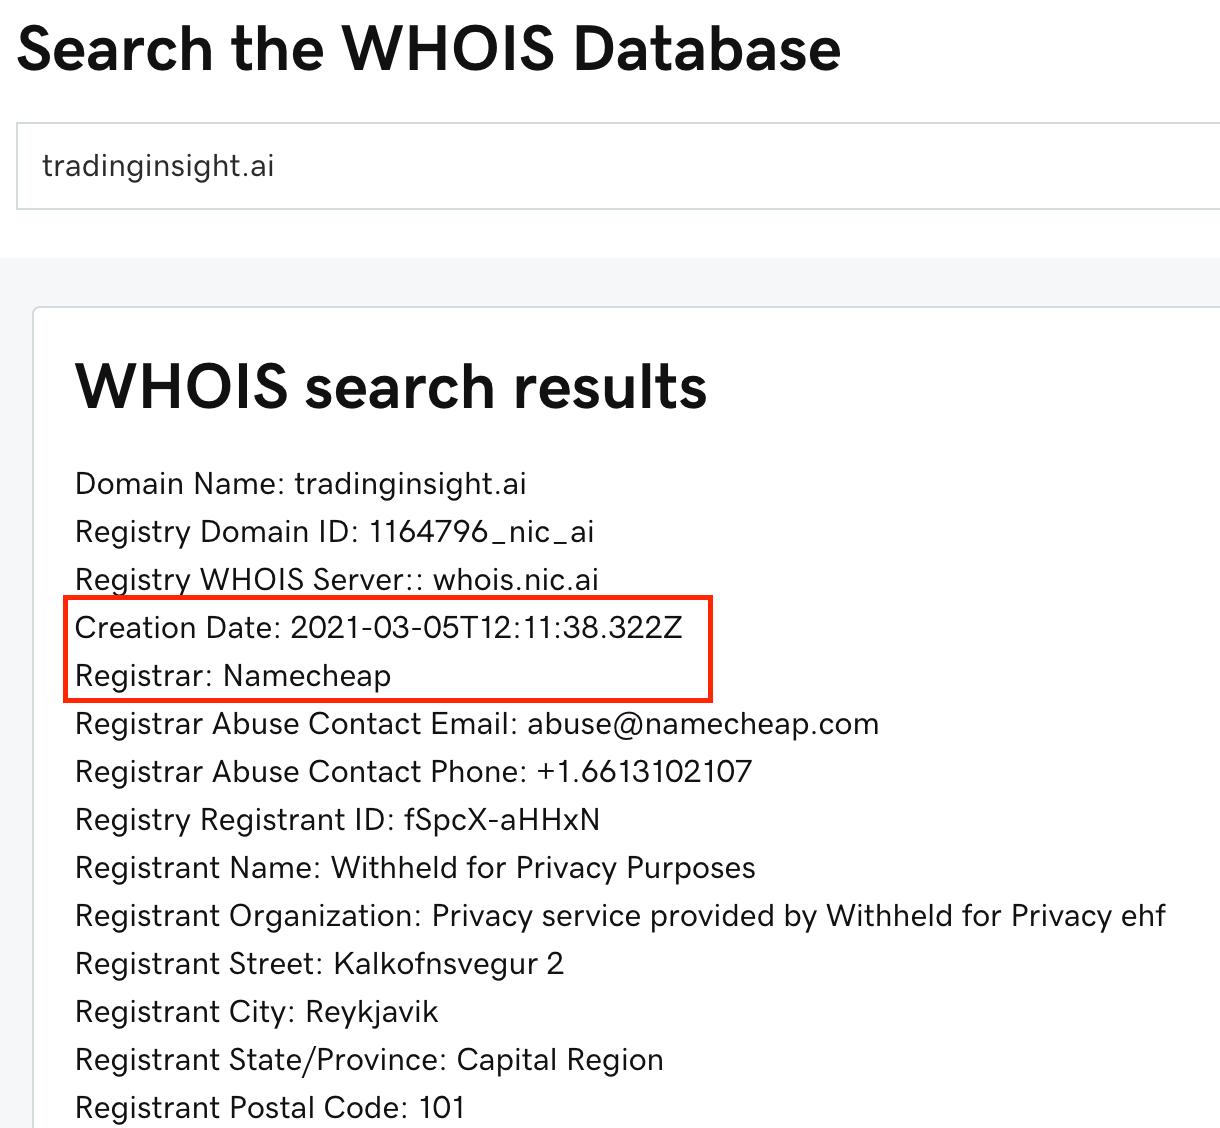 Trading Insight AI domain